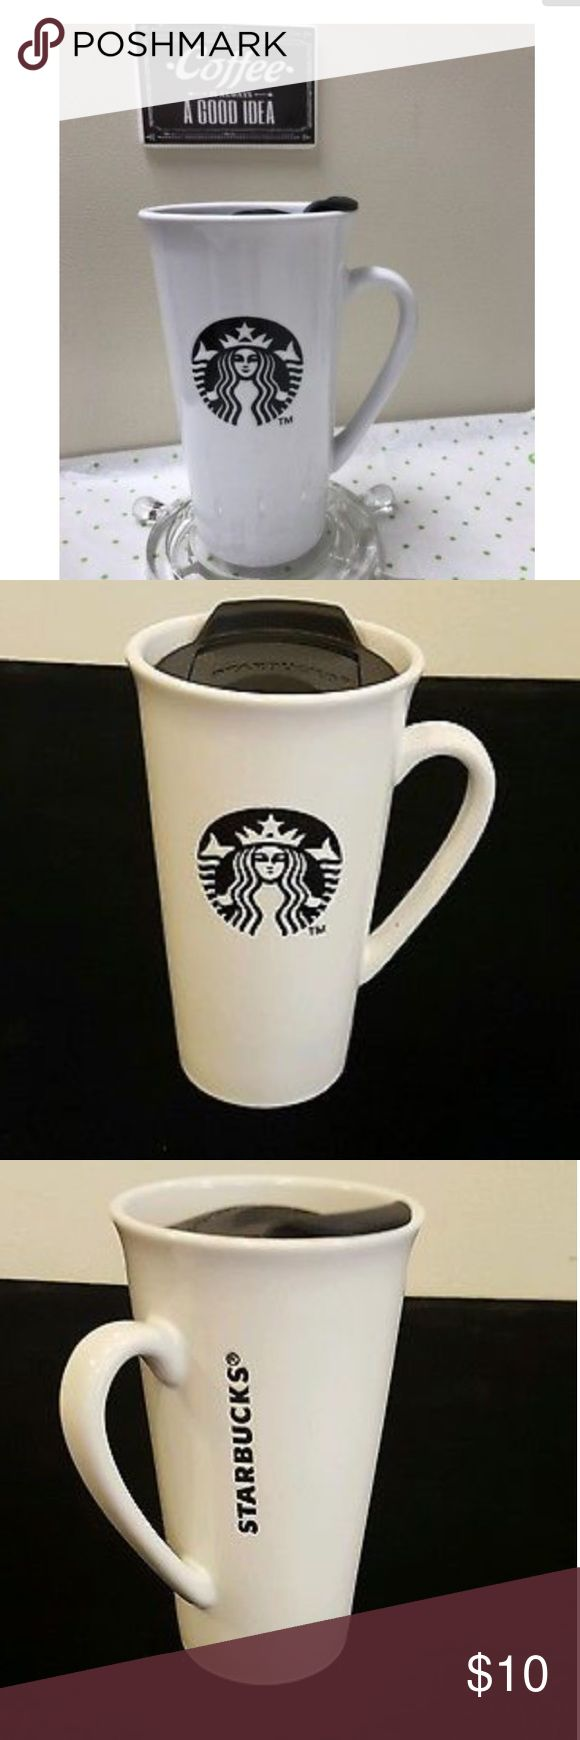 Starbucks 16 oz mug Starbucks 16oz ceramic mug with lid starbucks Other